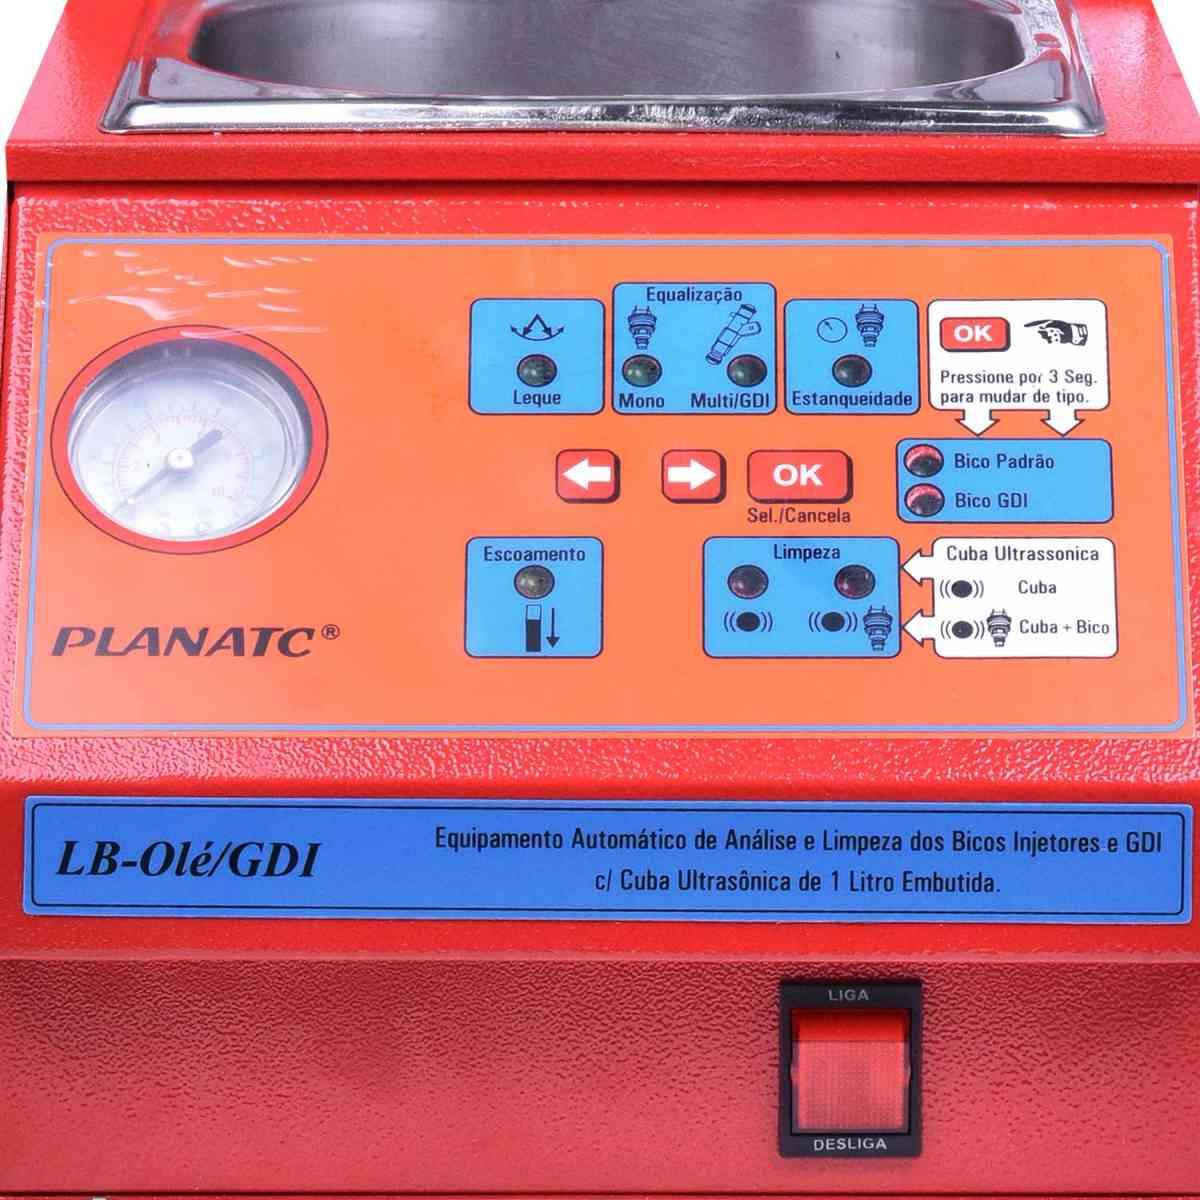 Máquina P/ Teste e limpeza de Bicos LB-OLE/GDI Planatc